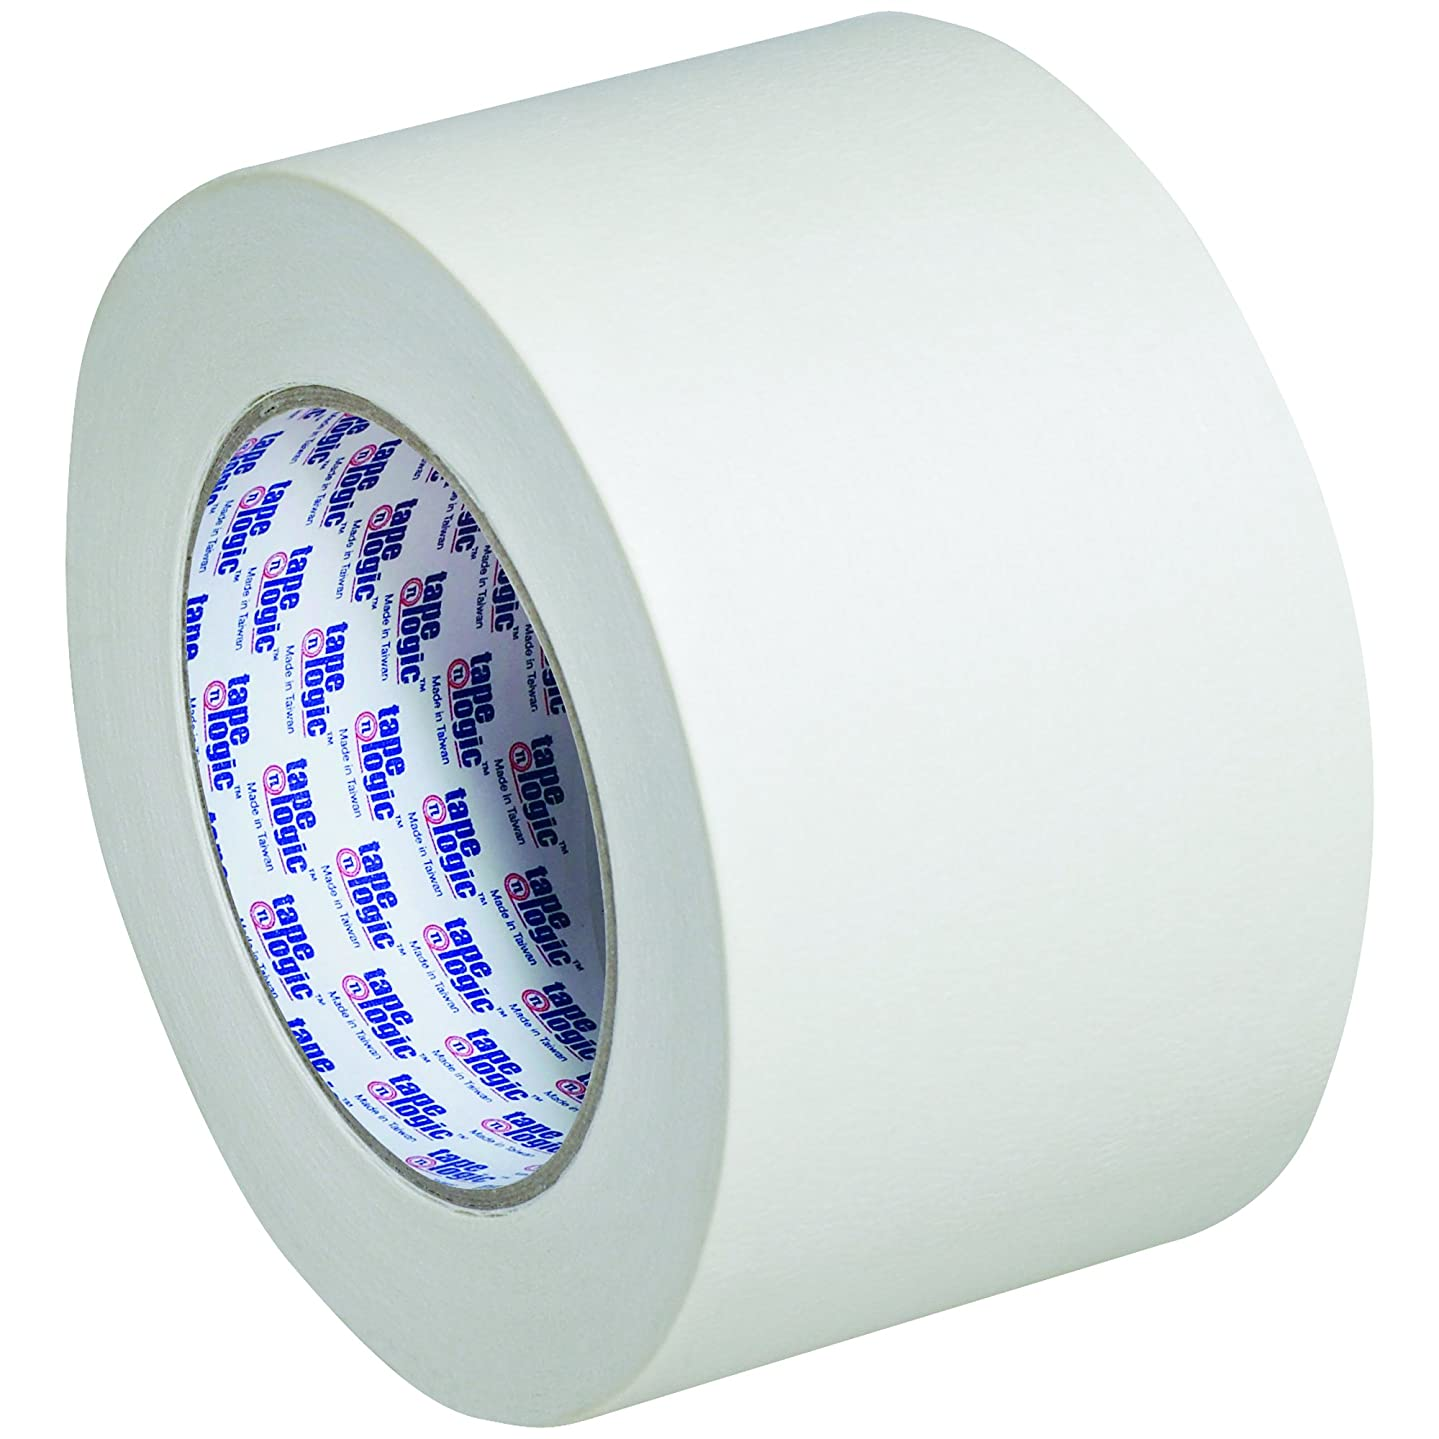 Partners Brand PT9382200 Tape Logic 2200 Masking Tape, 3